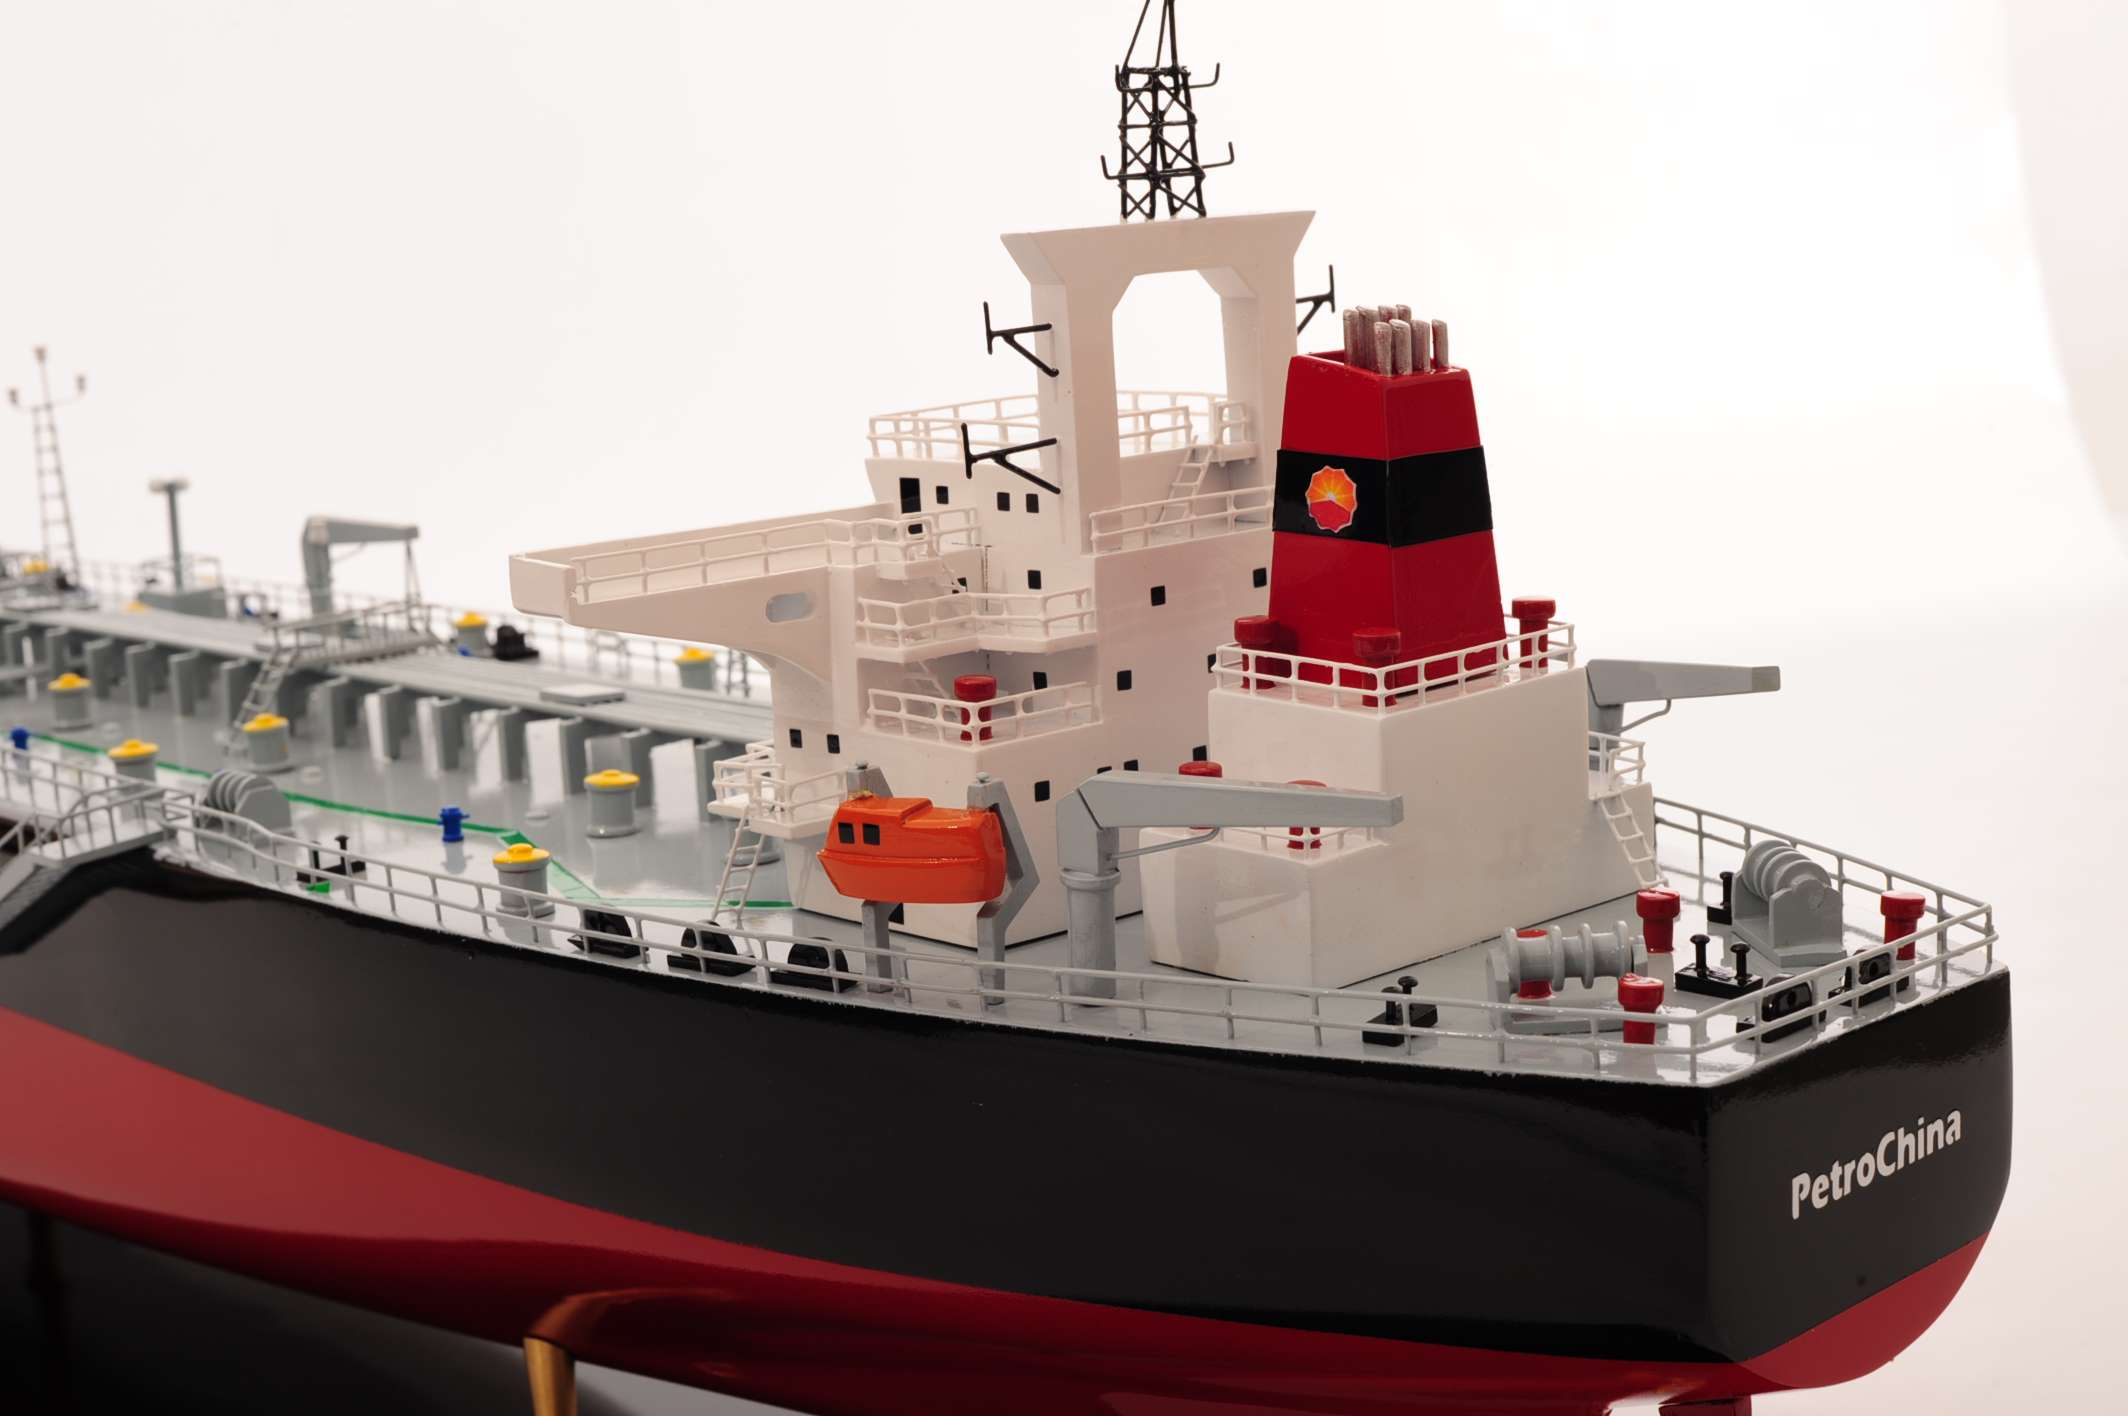 1475-4409-Very-Large-Crude-Oil-VLCC-Tanker